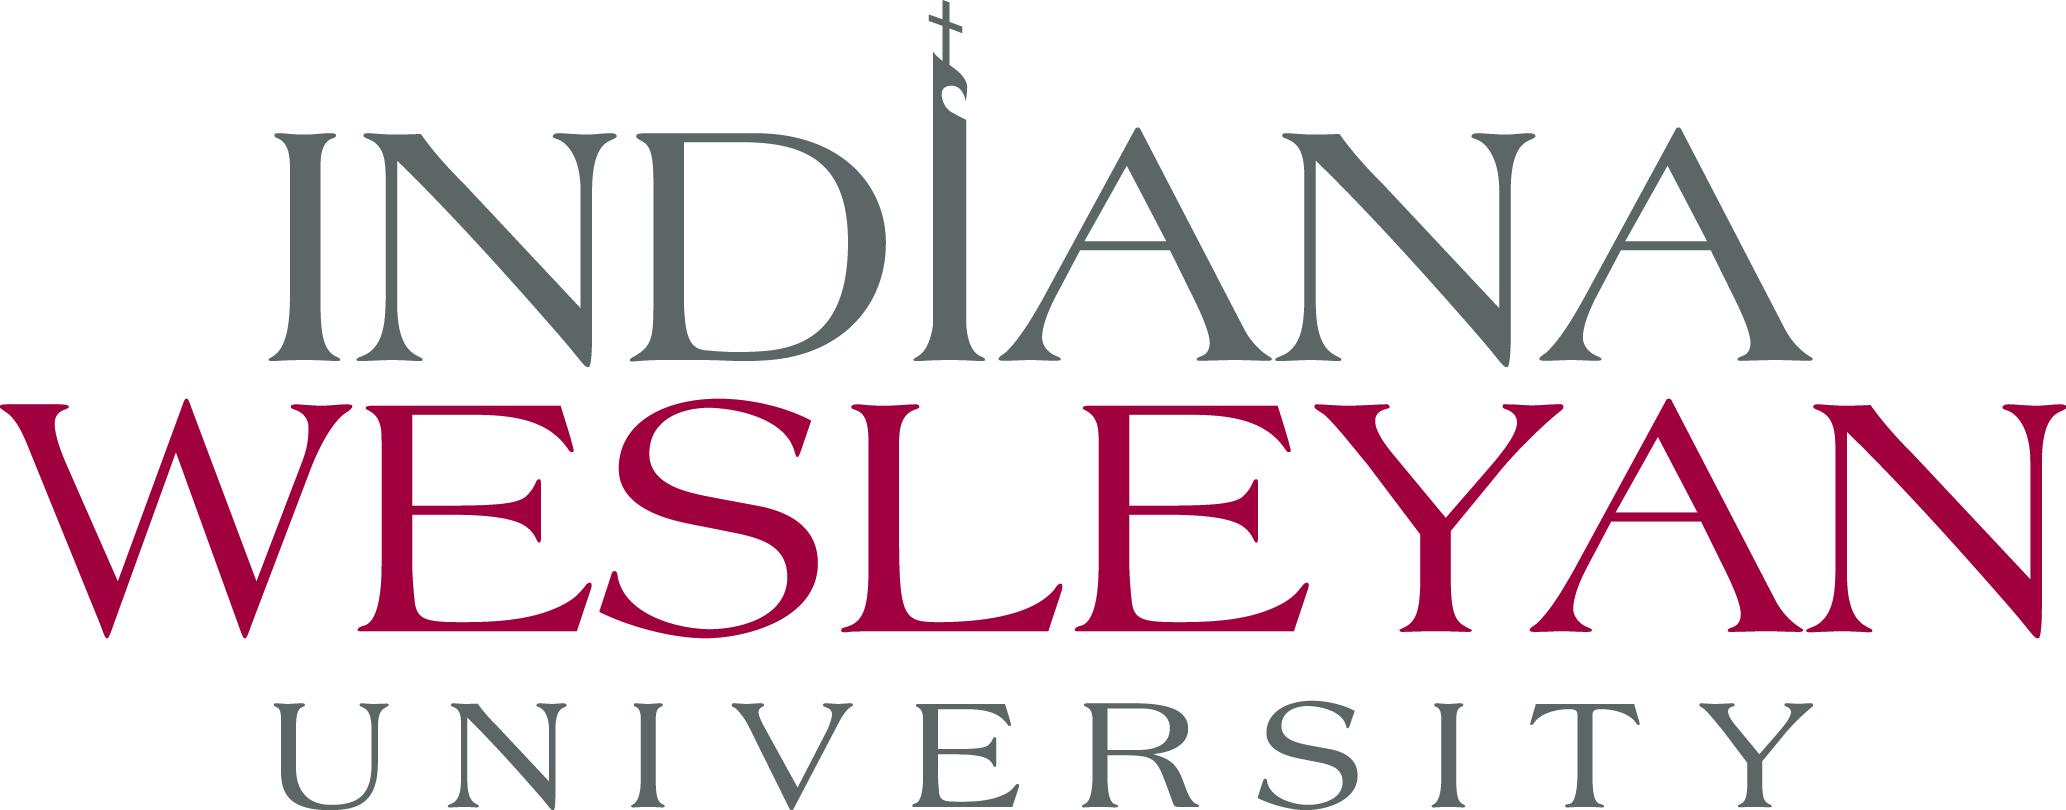 Indiana wesleyan university indiana teacher certification courses indiana wesleyan university 1betcityfo Image collections